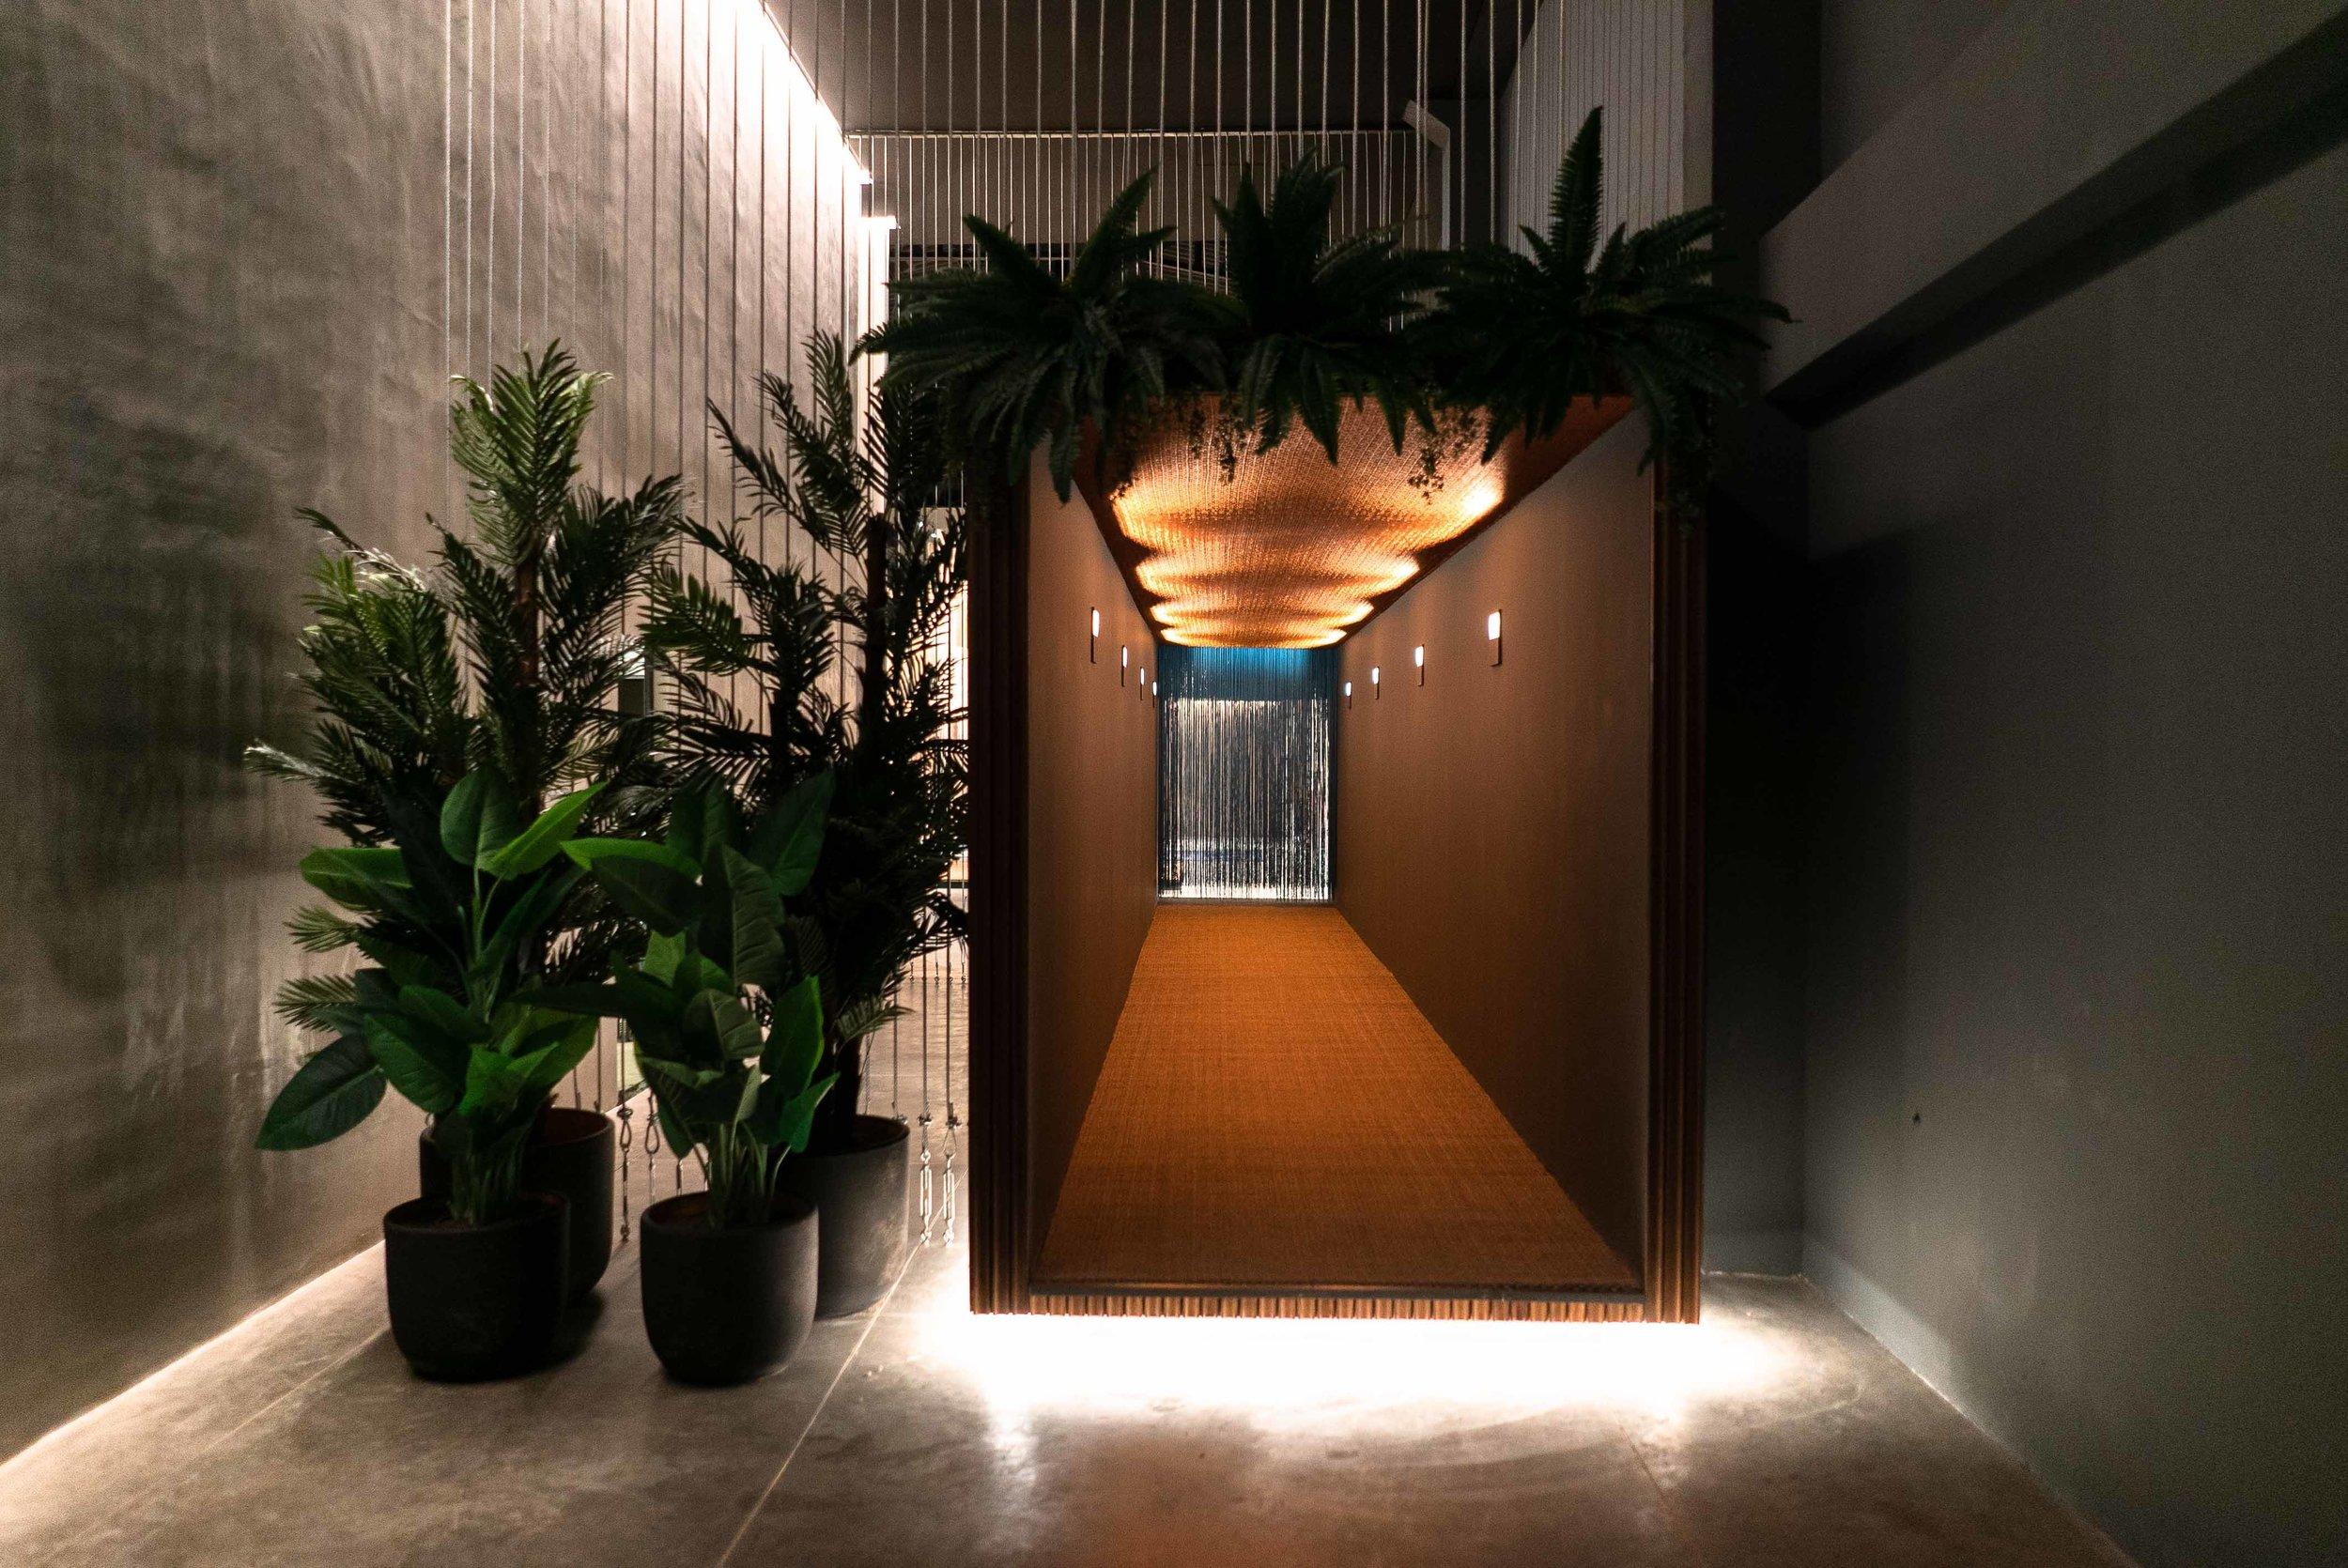 verdi showroom-85.jpg